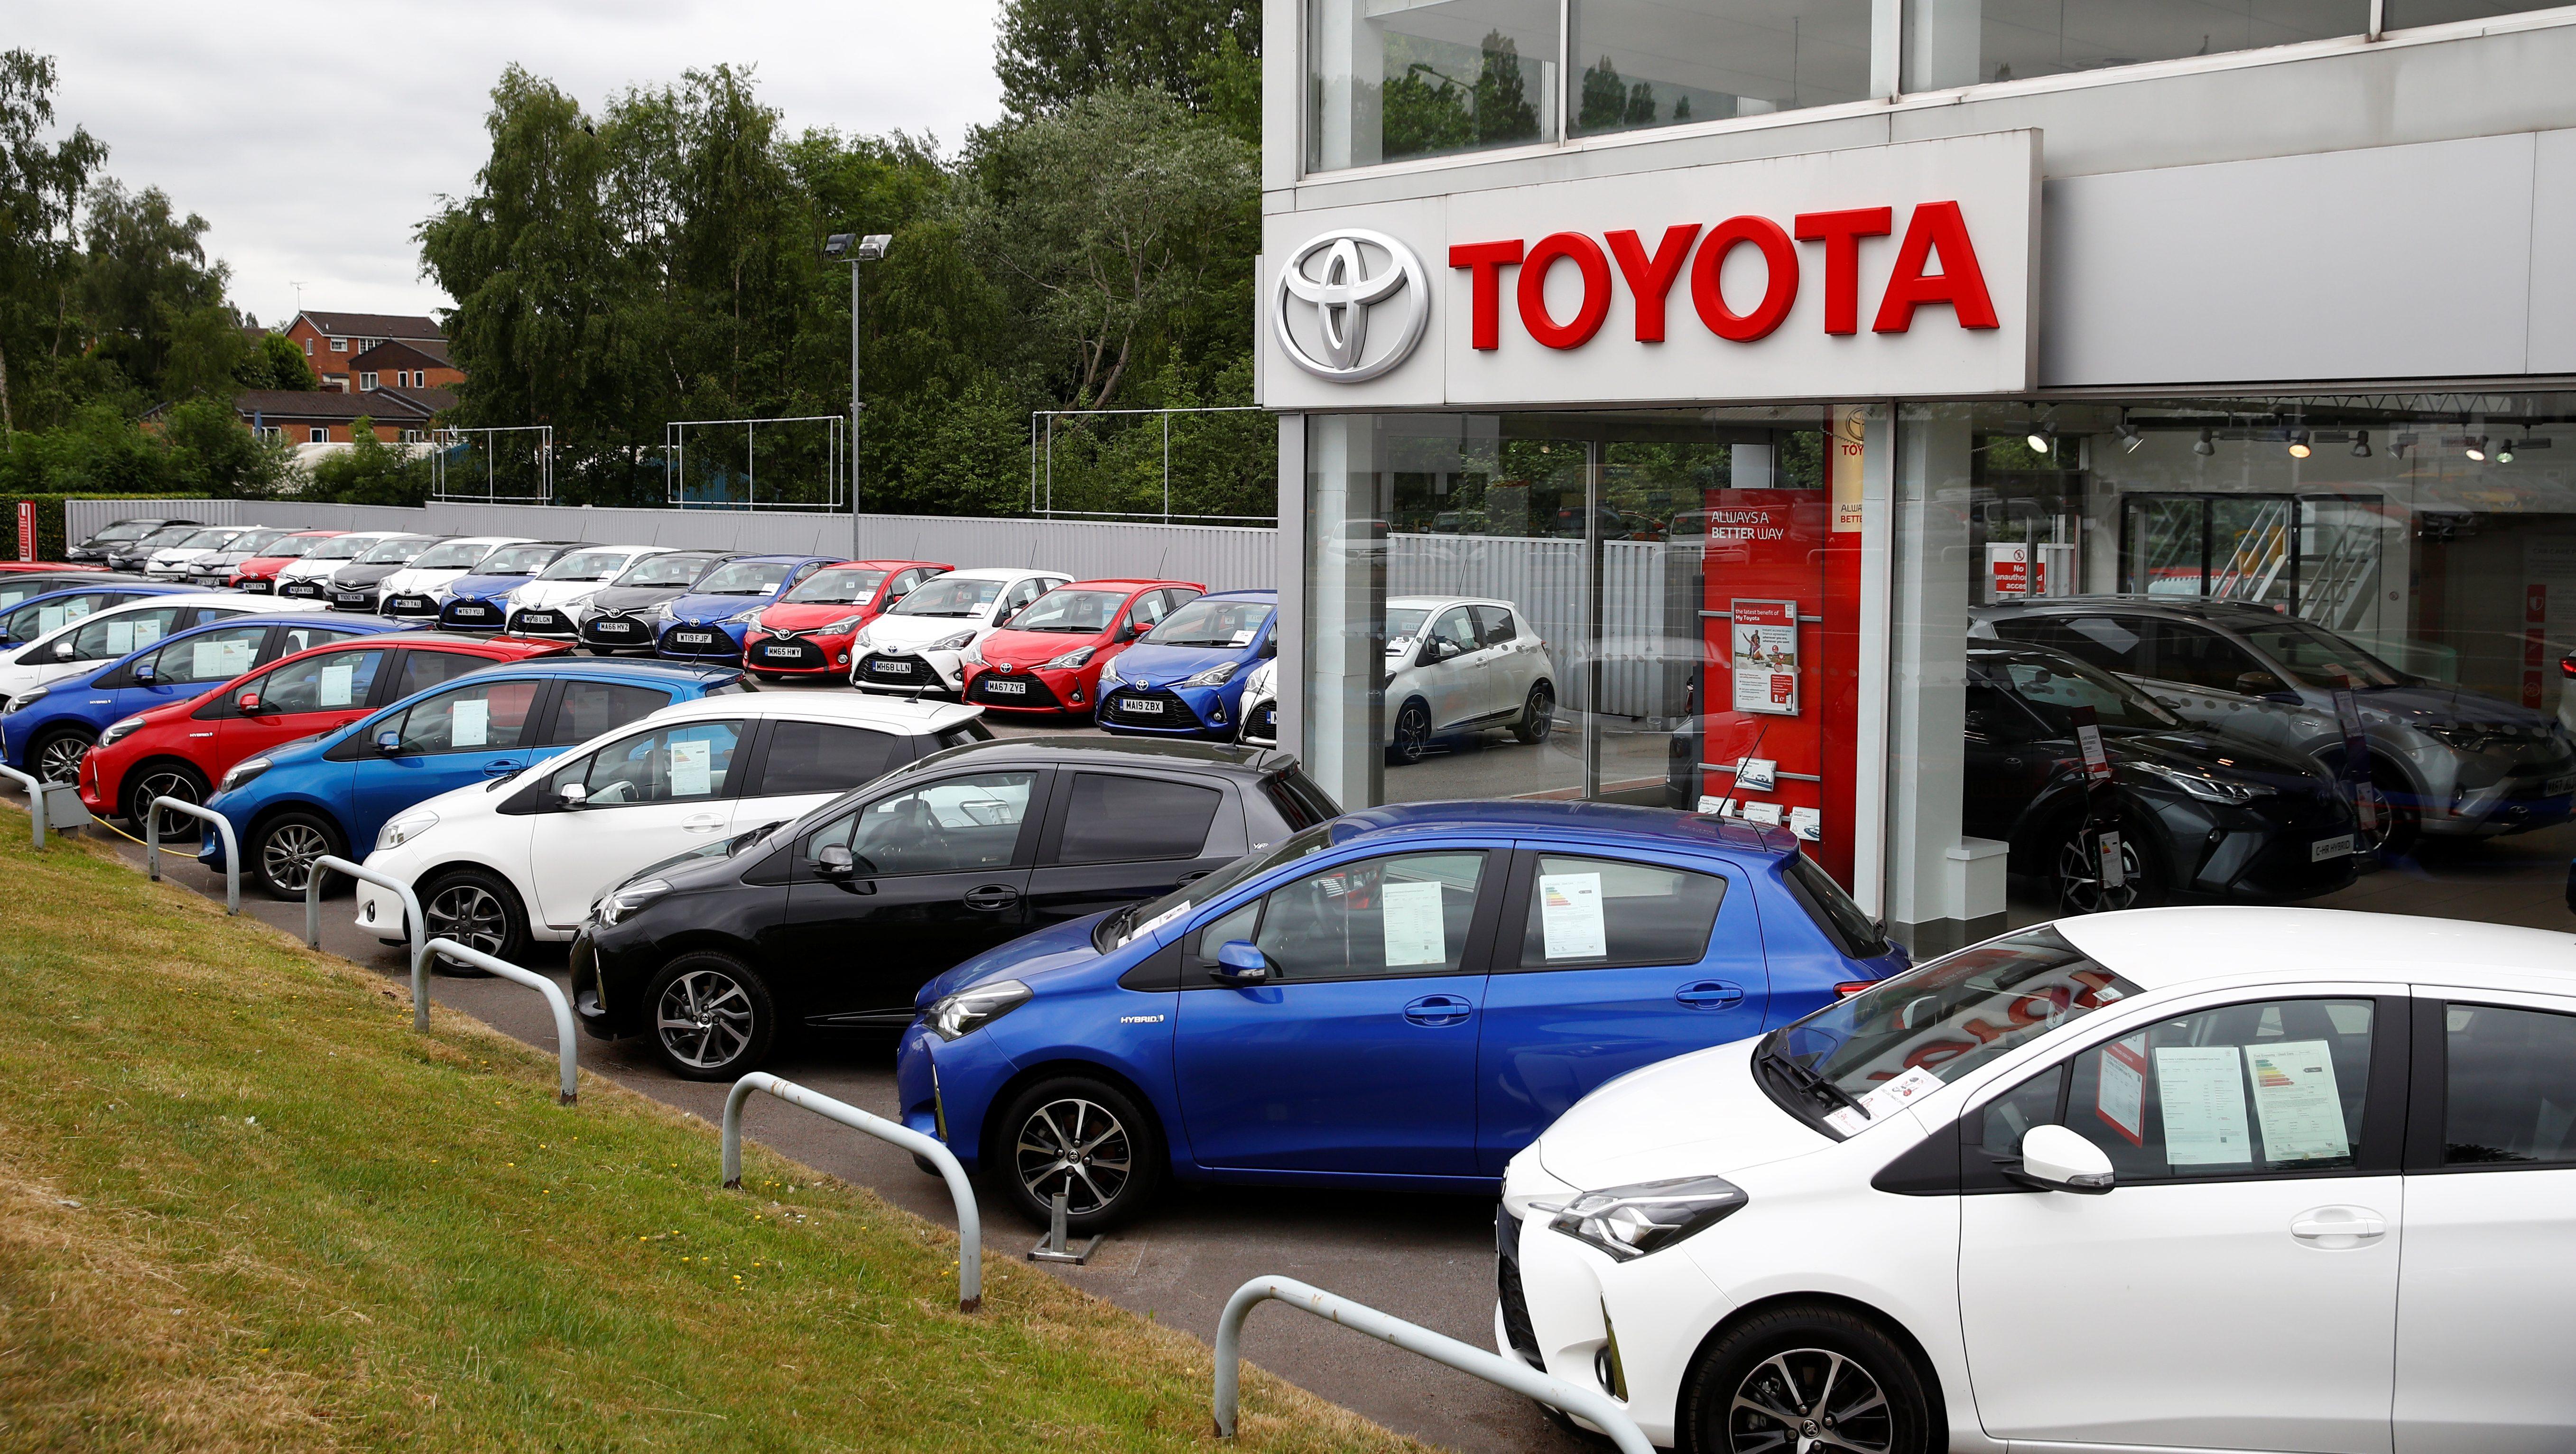 Modi government can't afford Toyota, Maruti's low taxes ask — Quartz India